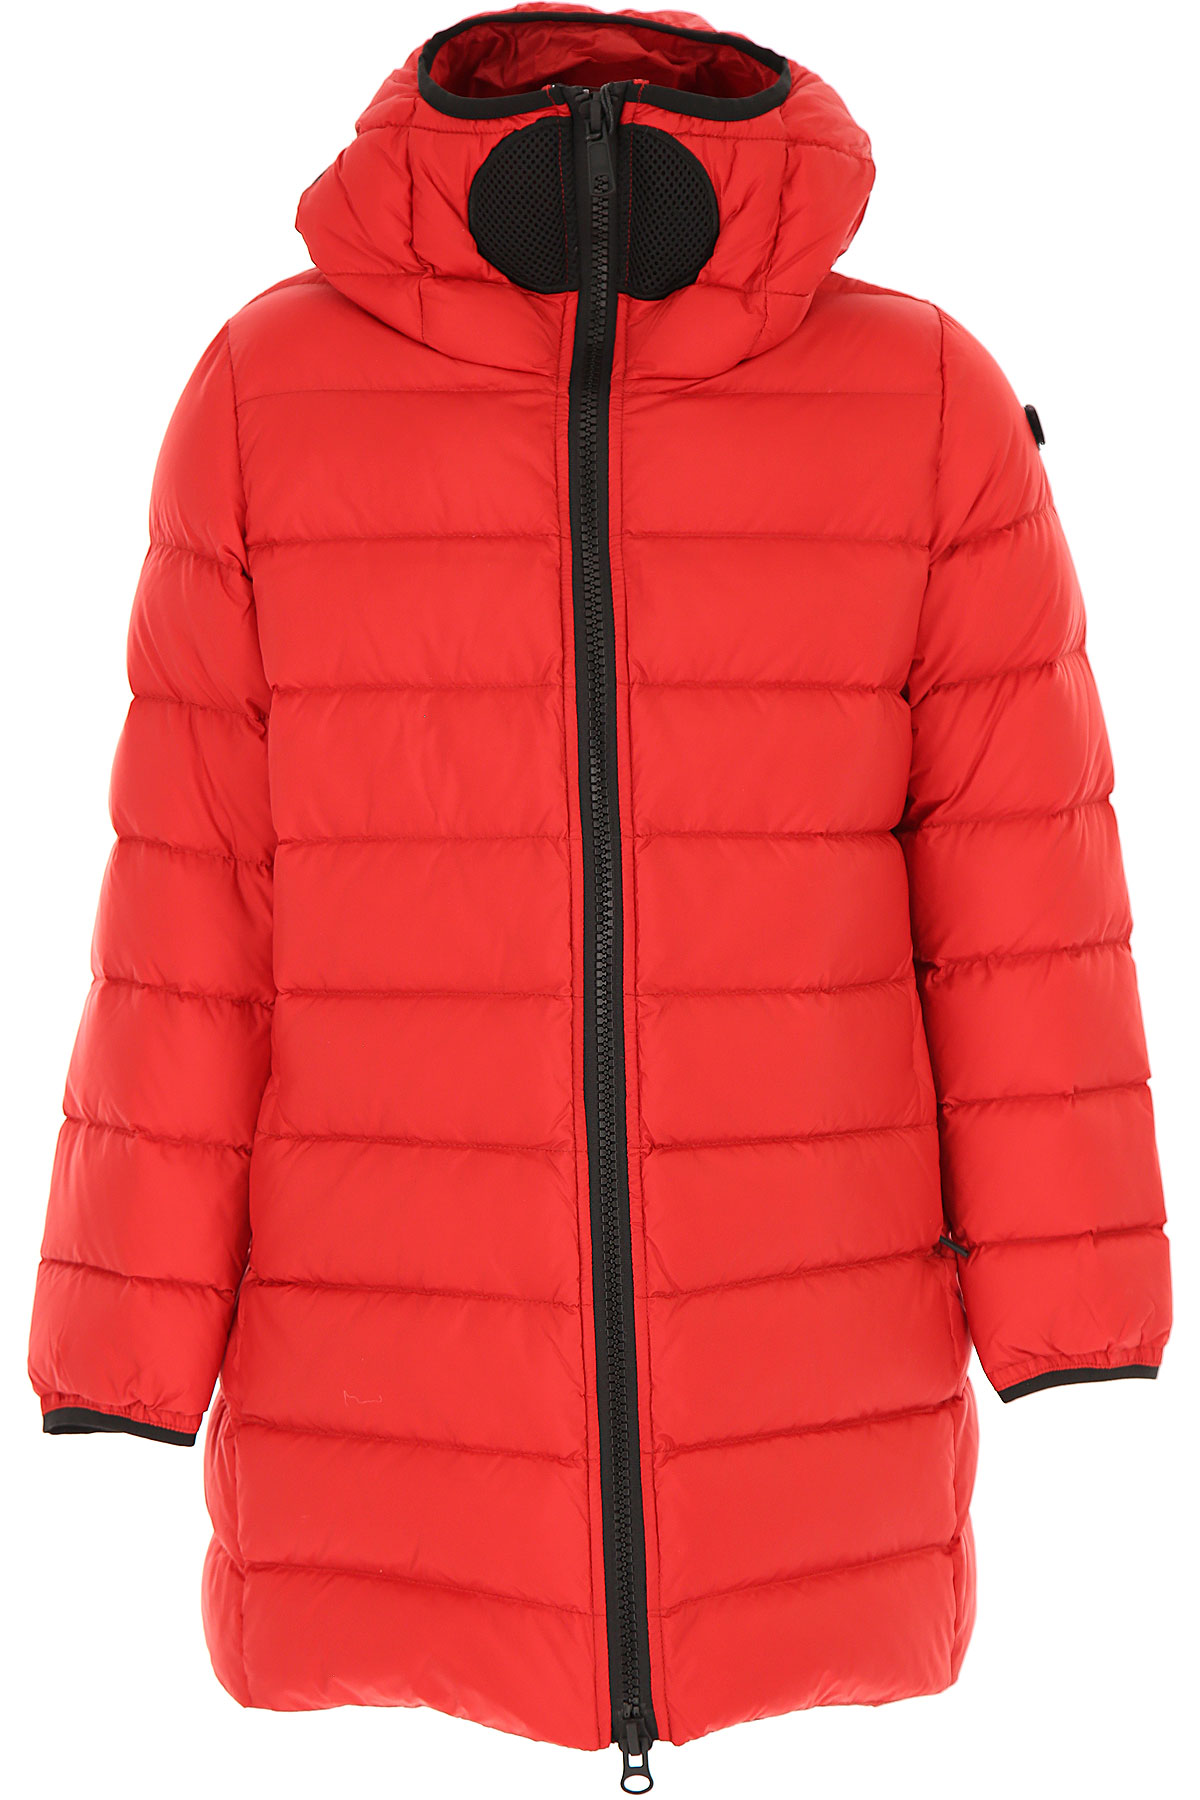 Ai Riders On The Storm Boys Down Jacket for Kids, Puffer Ski Jacket On Sale, Flame Red, Nylon, 2019, 10Y 12Y 14Y 4Y 6Y 8Y